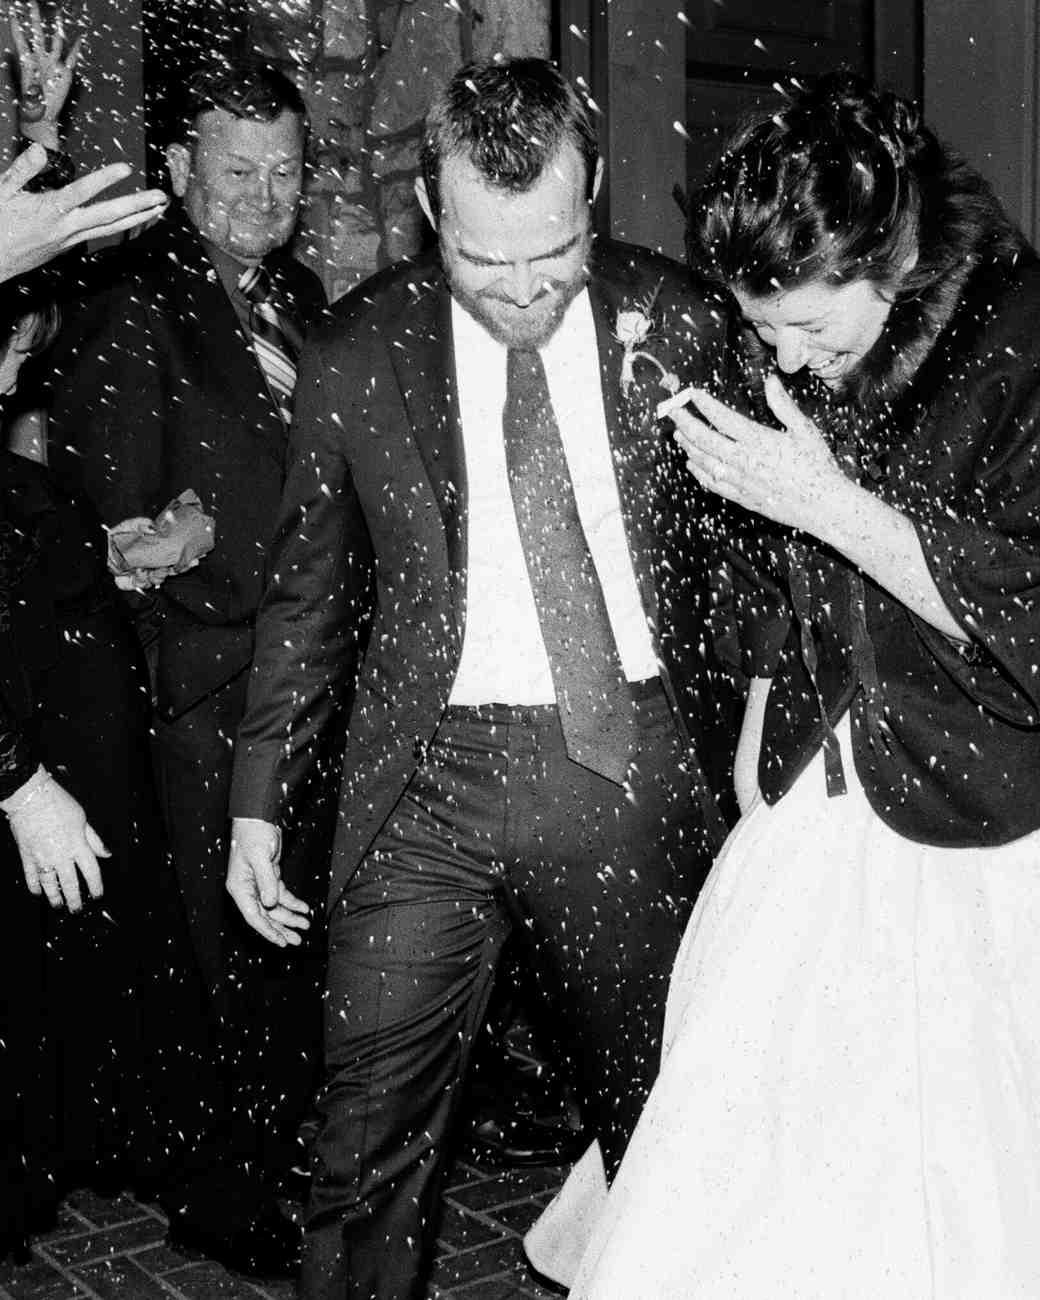 jane-ryan-wedding-getaway-331-s111352-0714.jpg